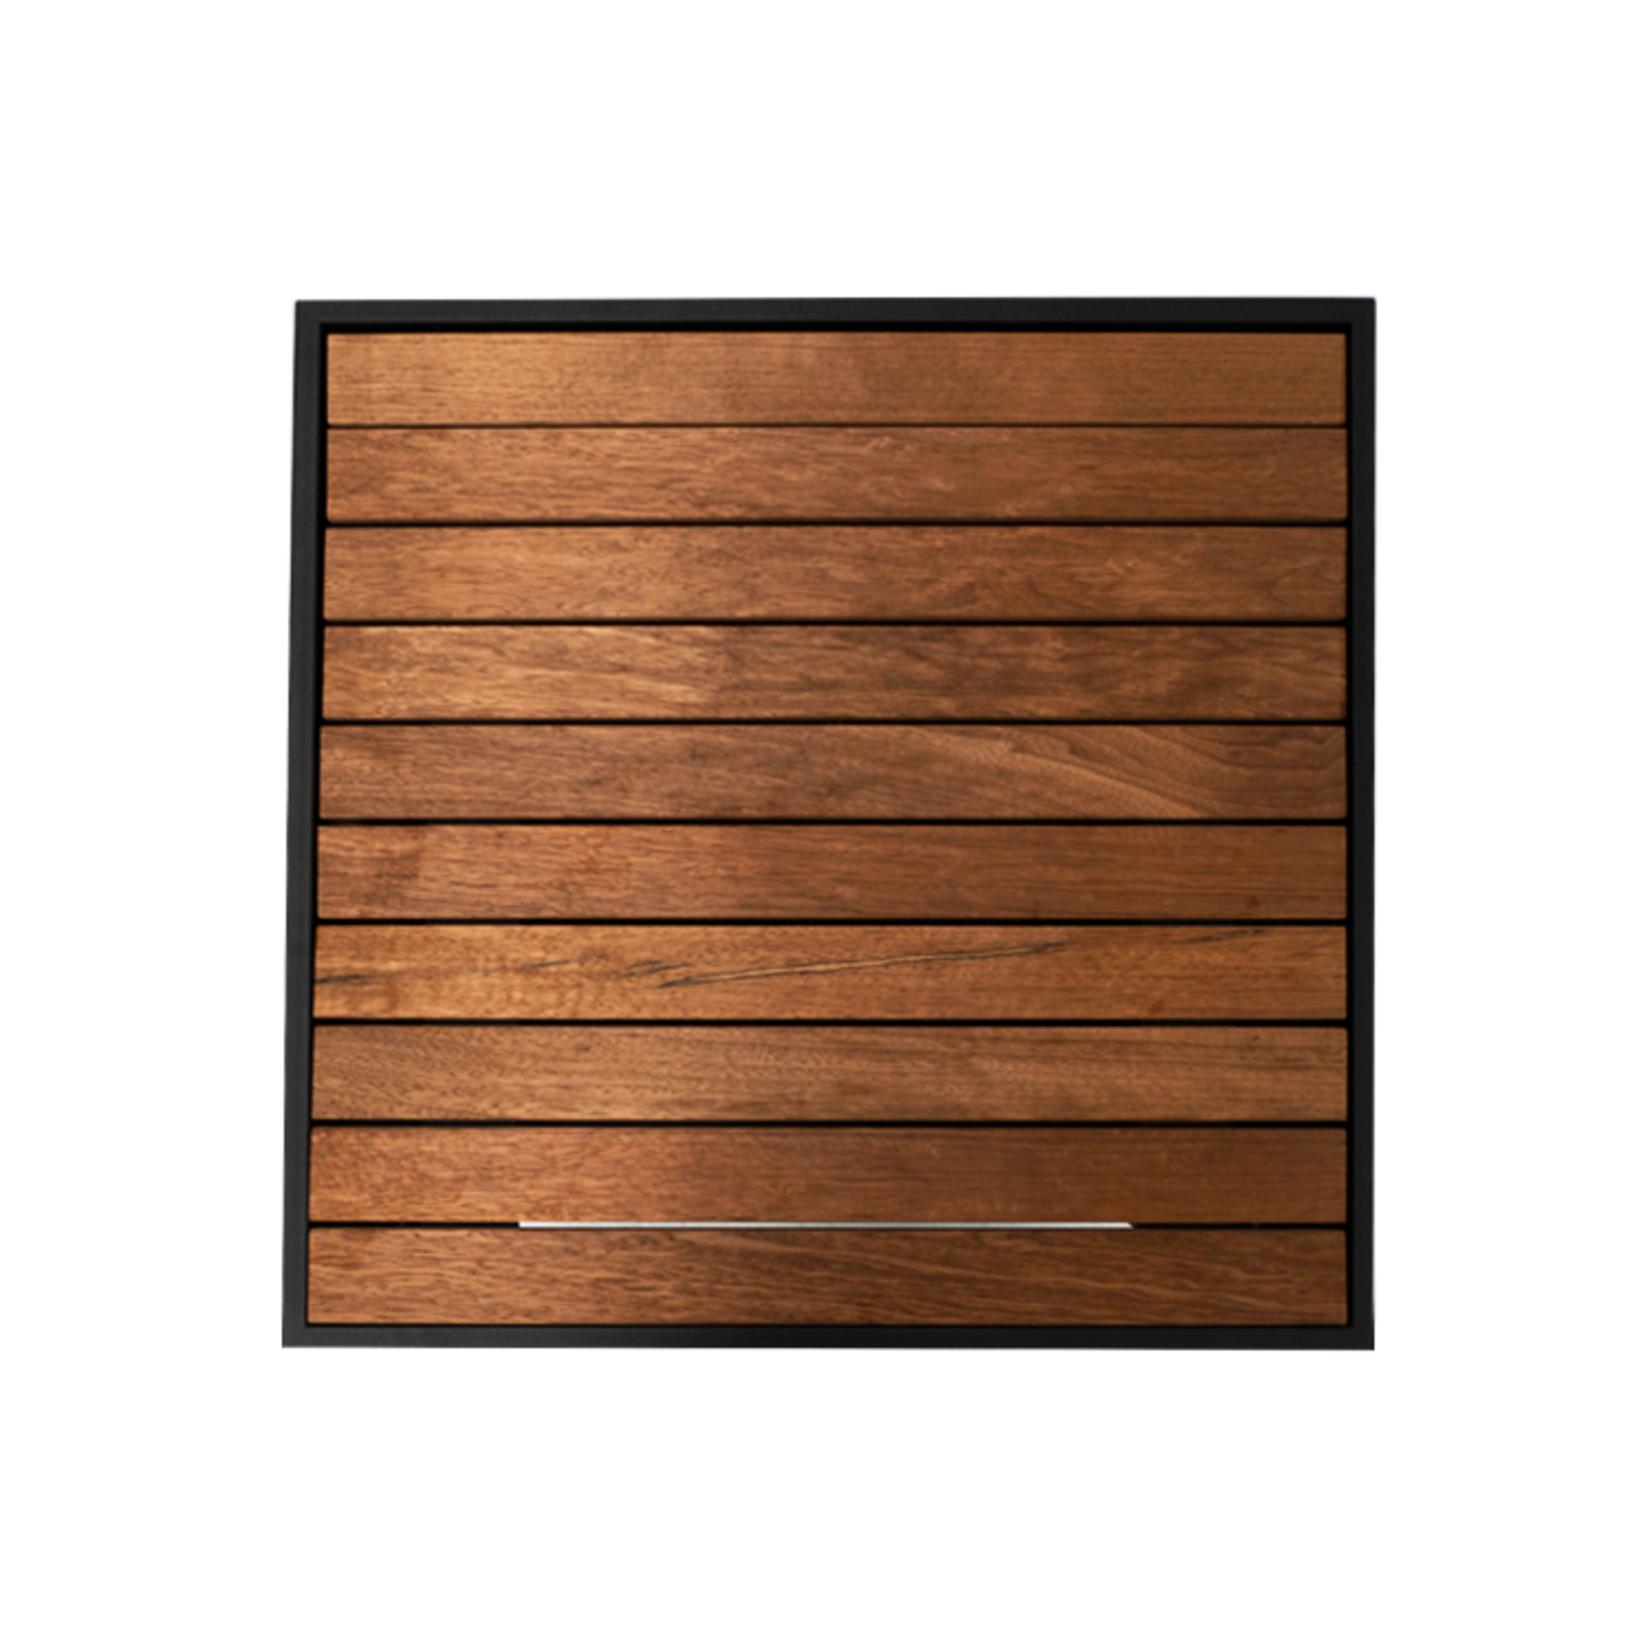 Roostr Rubix Inlay Wood Frake